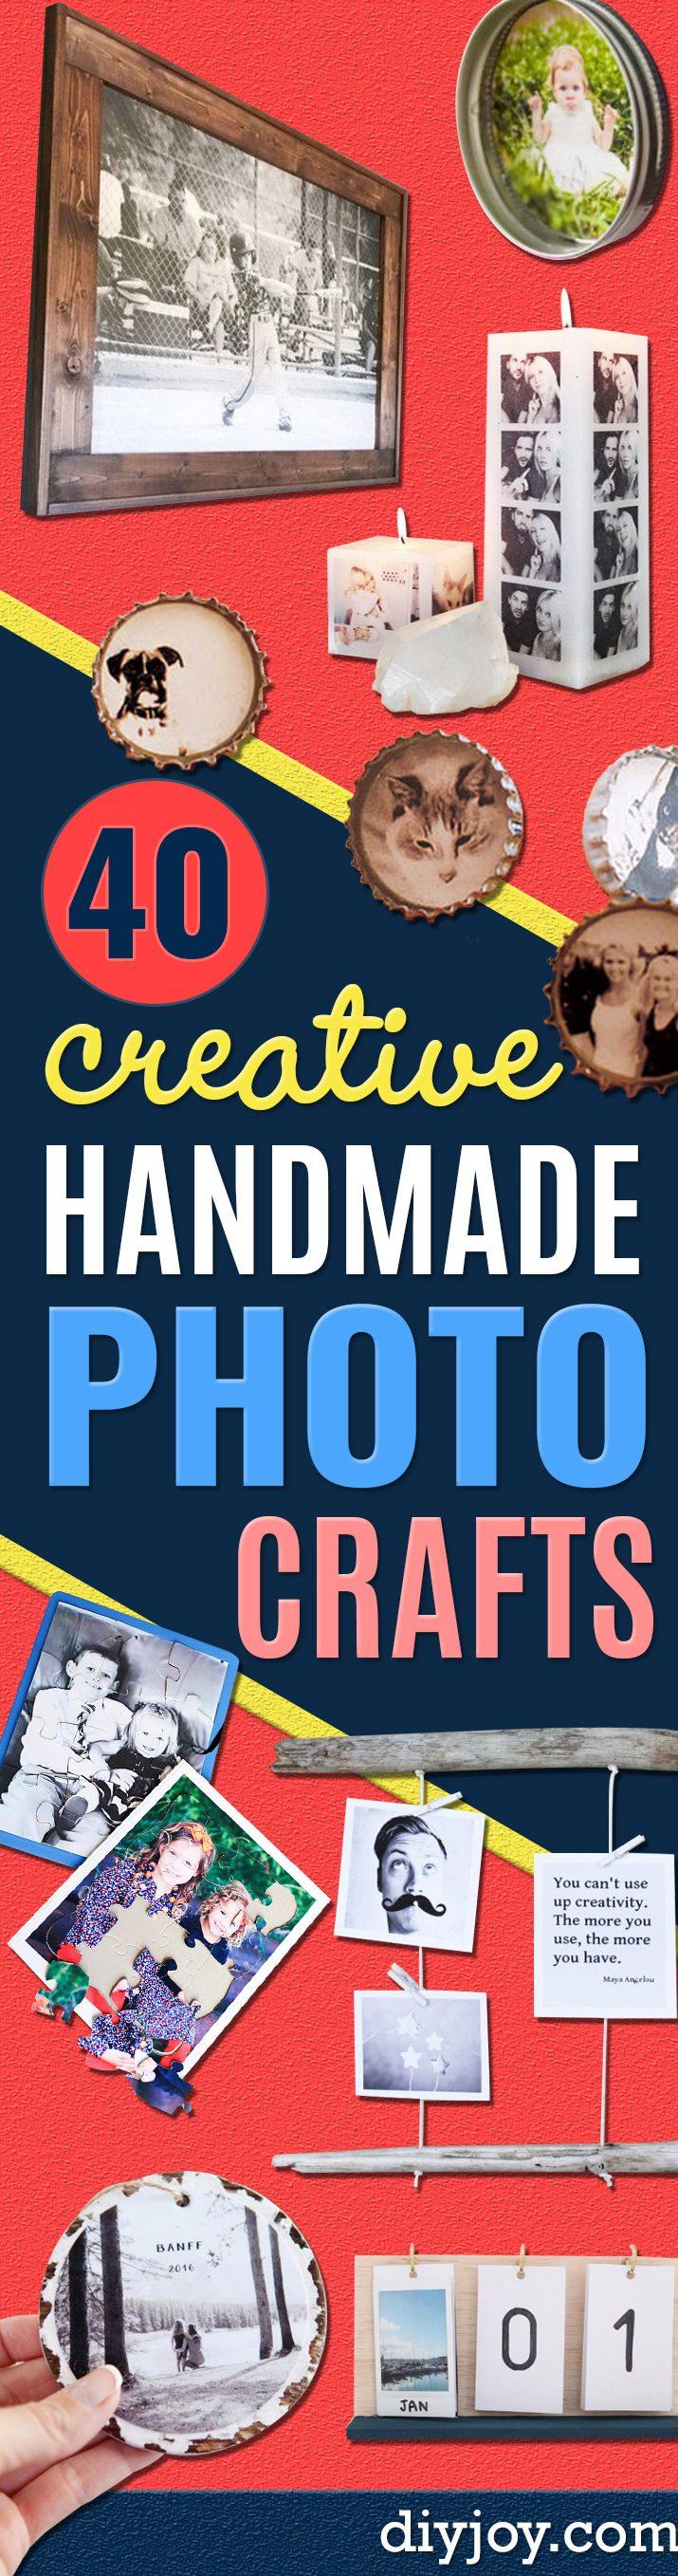 40 Creative Handmade Photo Crafts